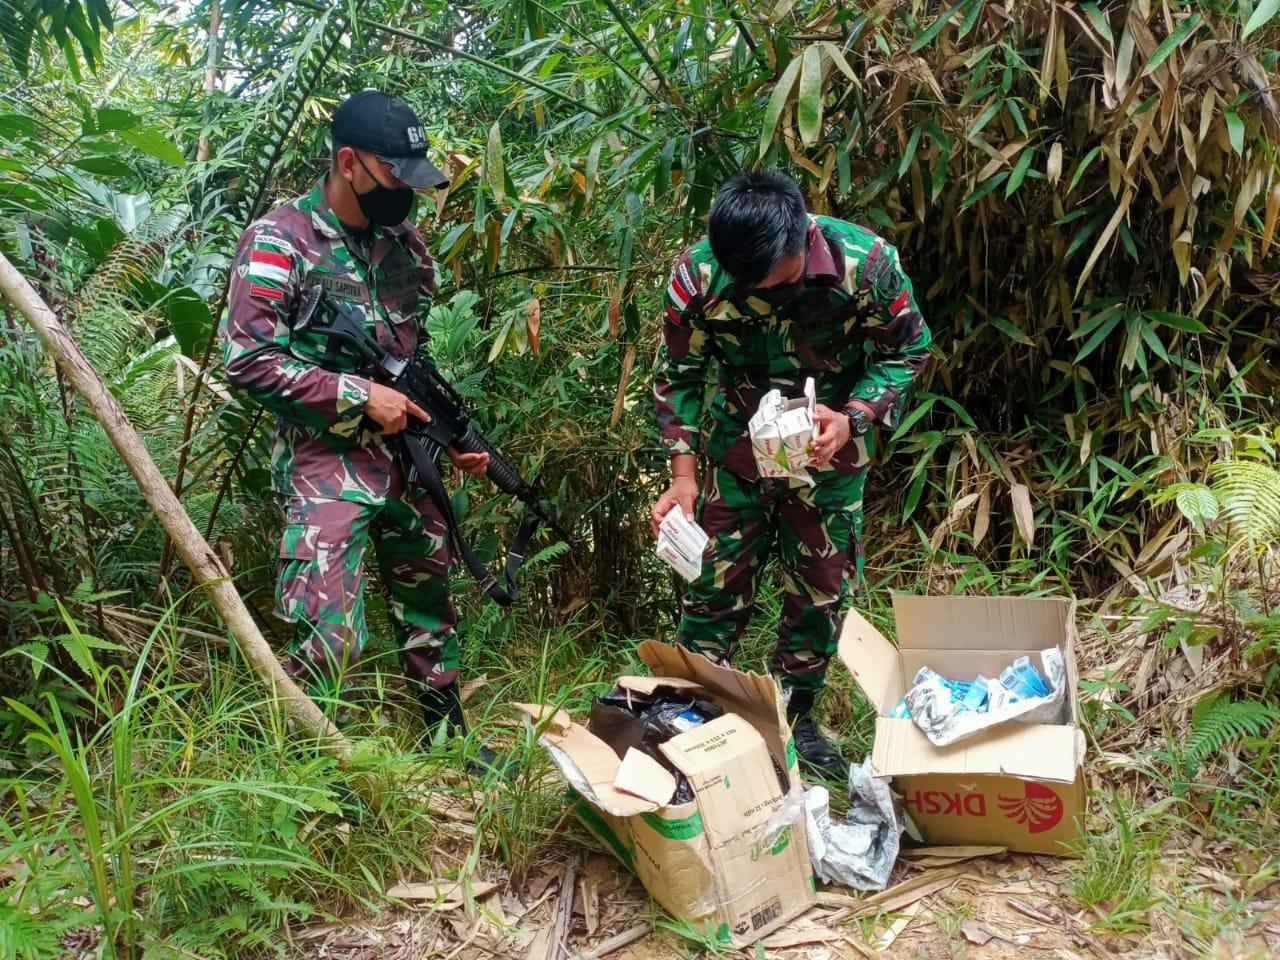 Satgas Pamtas RI-Malaysia Amankan Dus Berisi Puluhan Jenis Obat-Obatan Ilegal